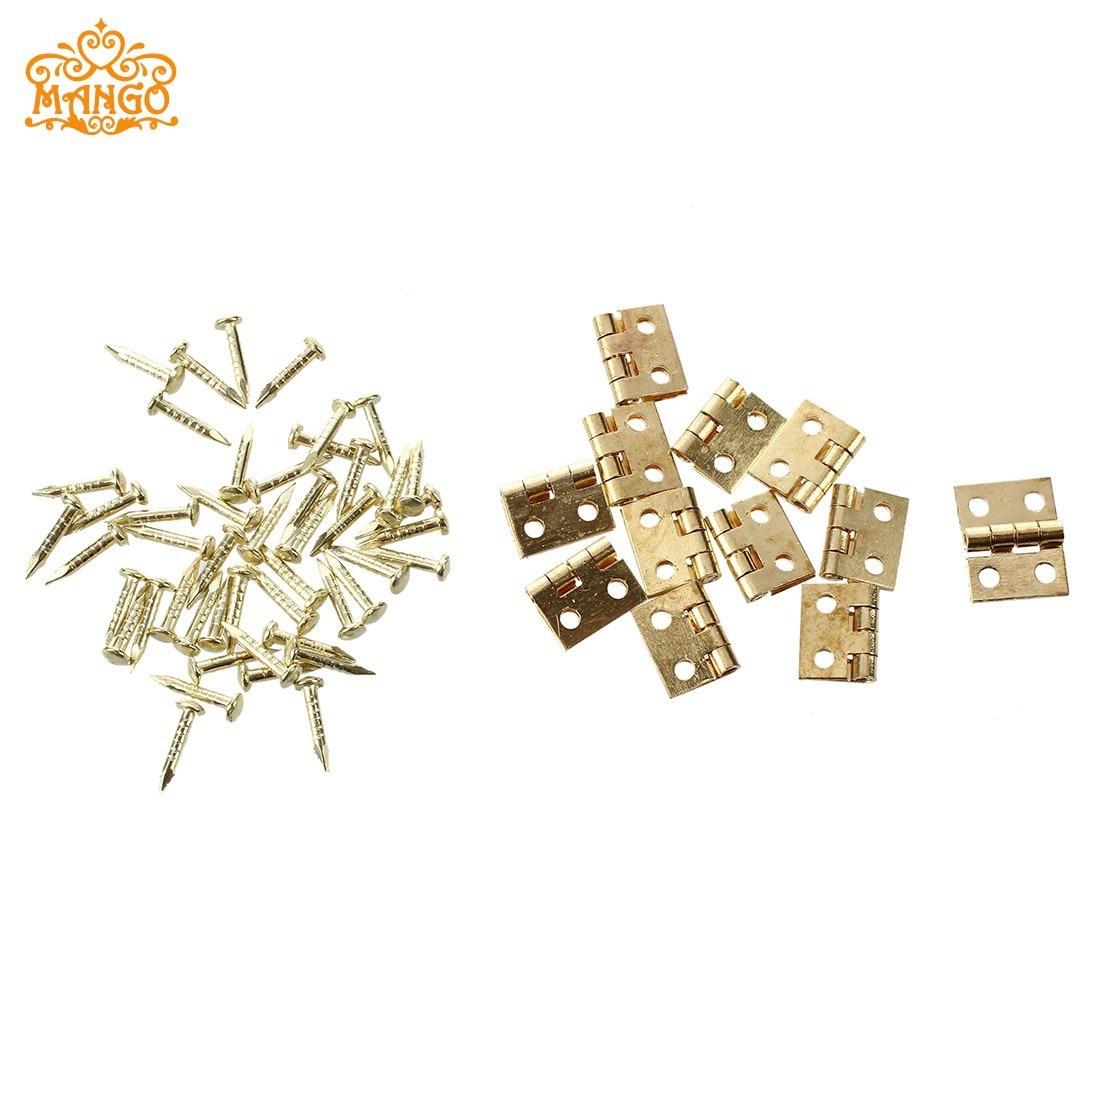 Doll House Dollhouse Model Mini Copper Hinge Building Model Material 12 Hinge + 48 Screw ~